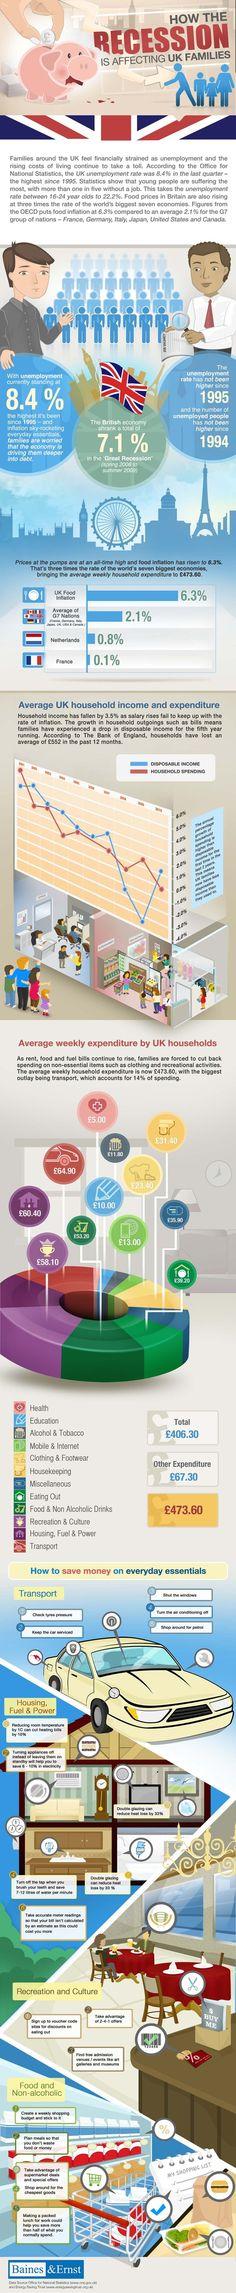 UK Recession Infographic